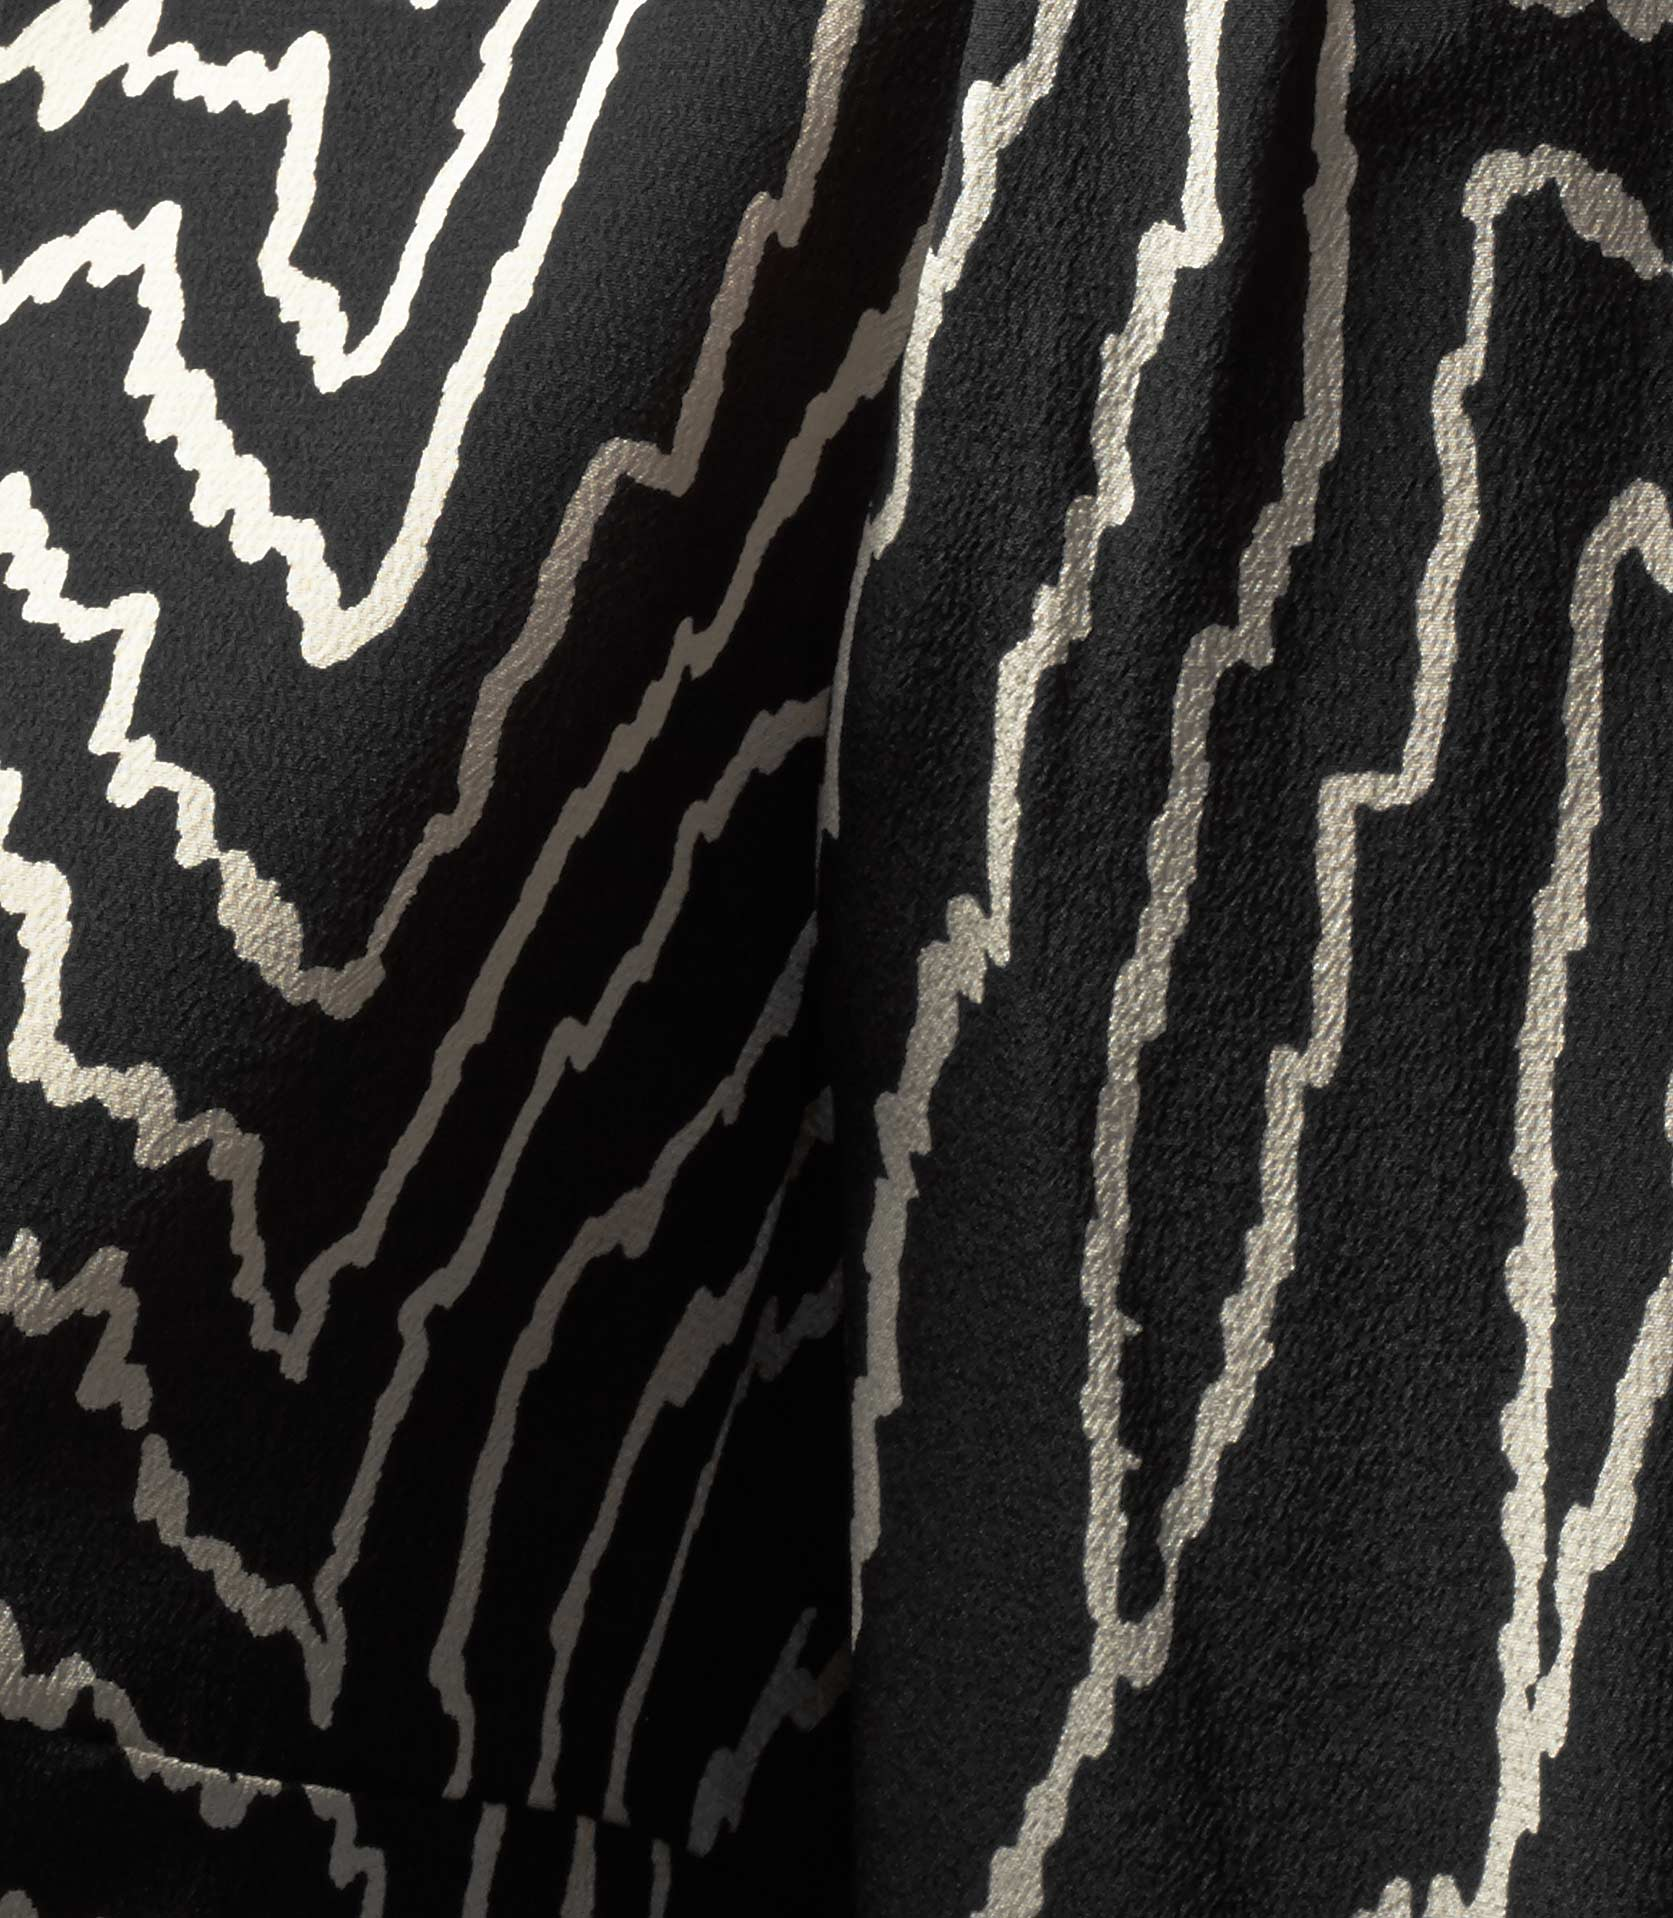 Marion Black Graphic Print Shirt - REISS